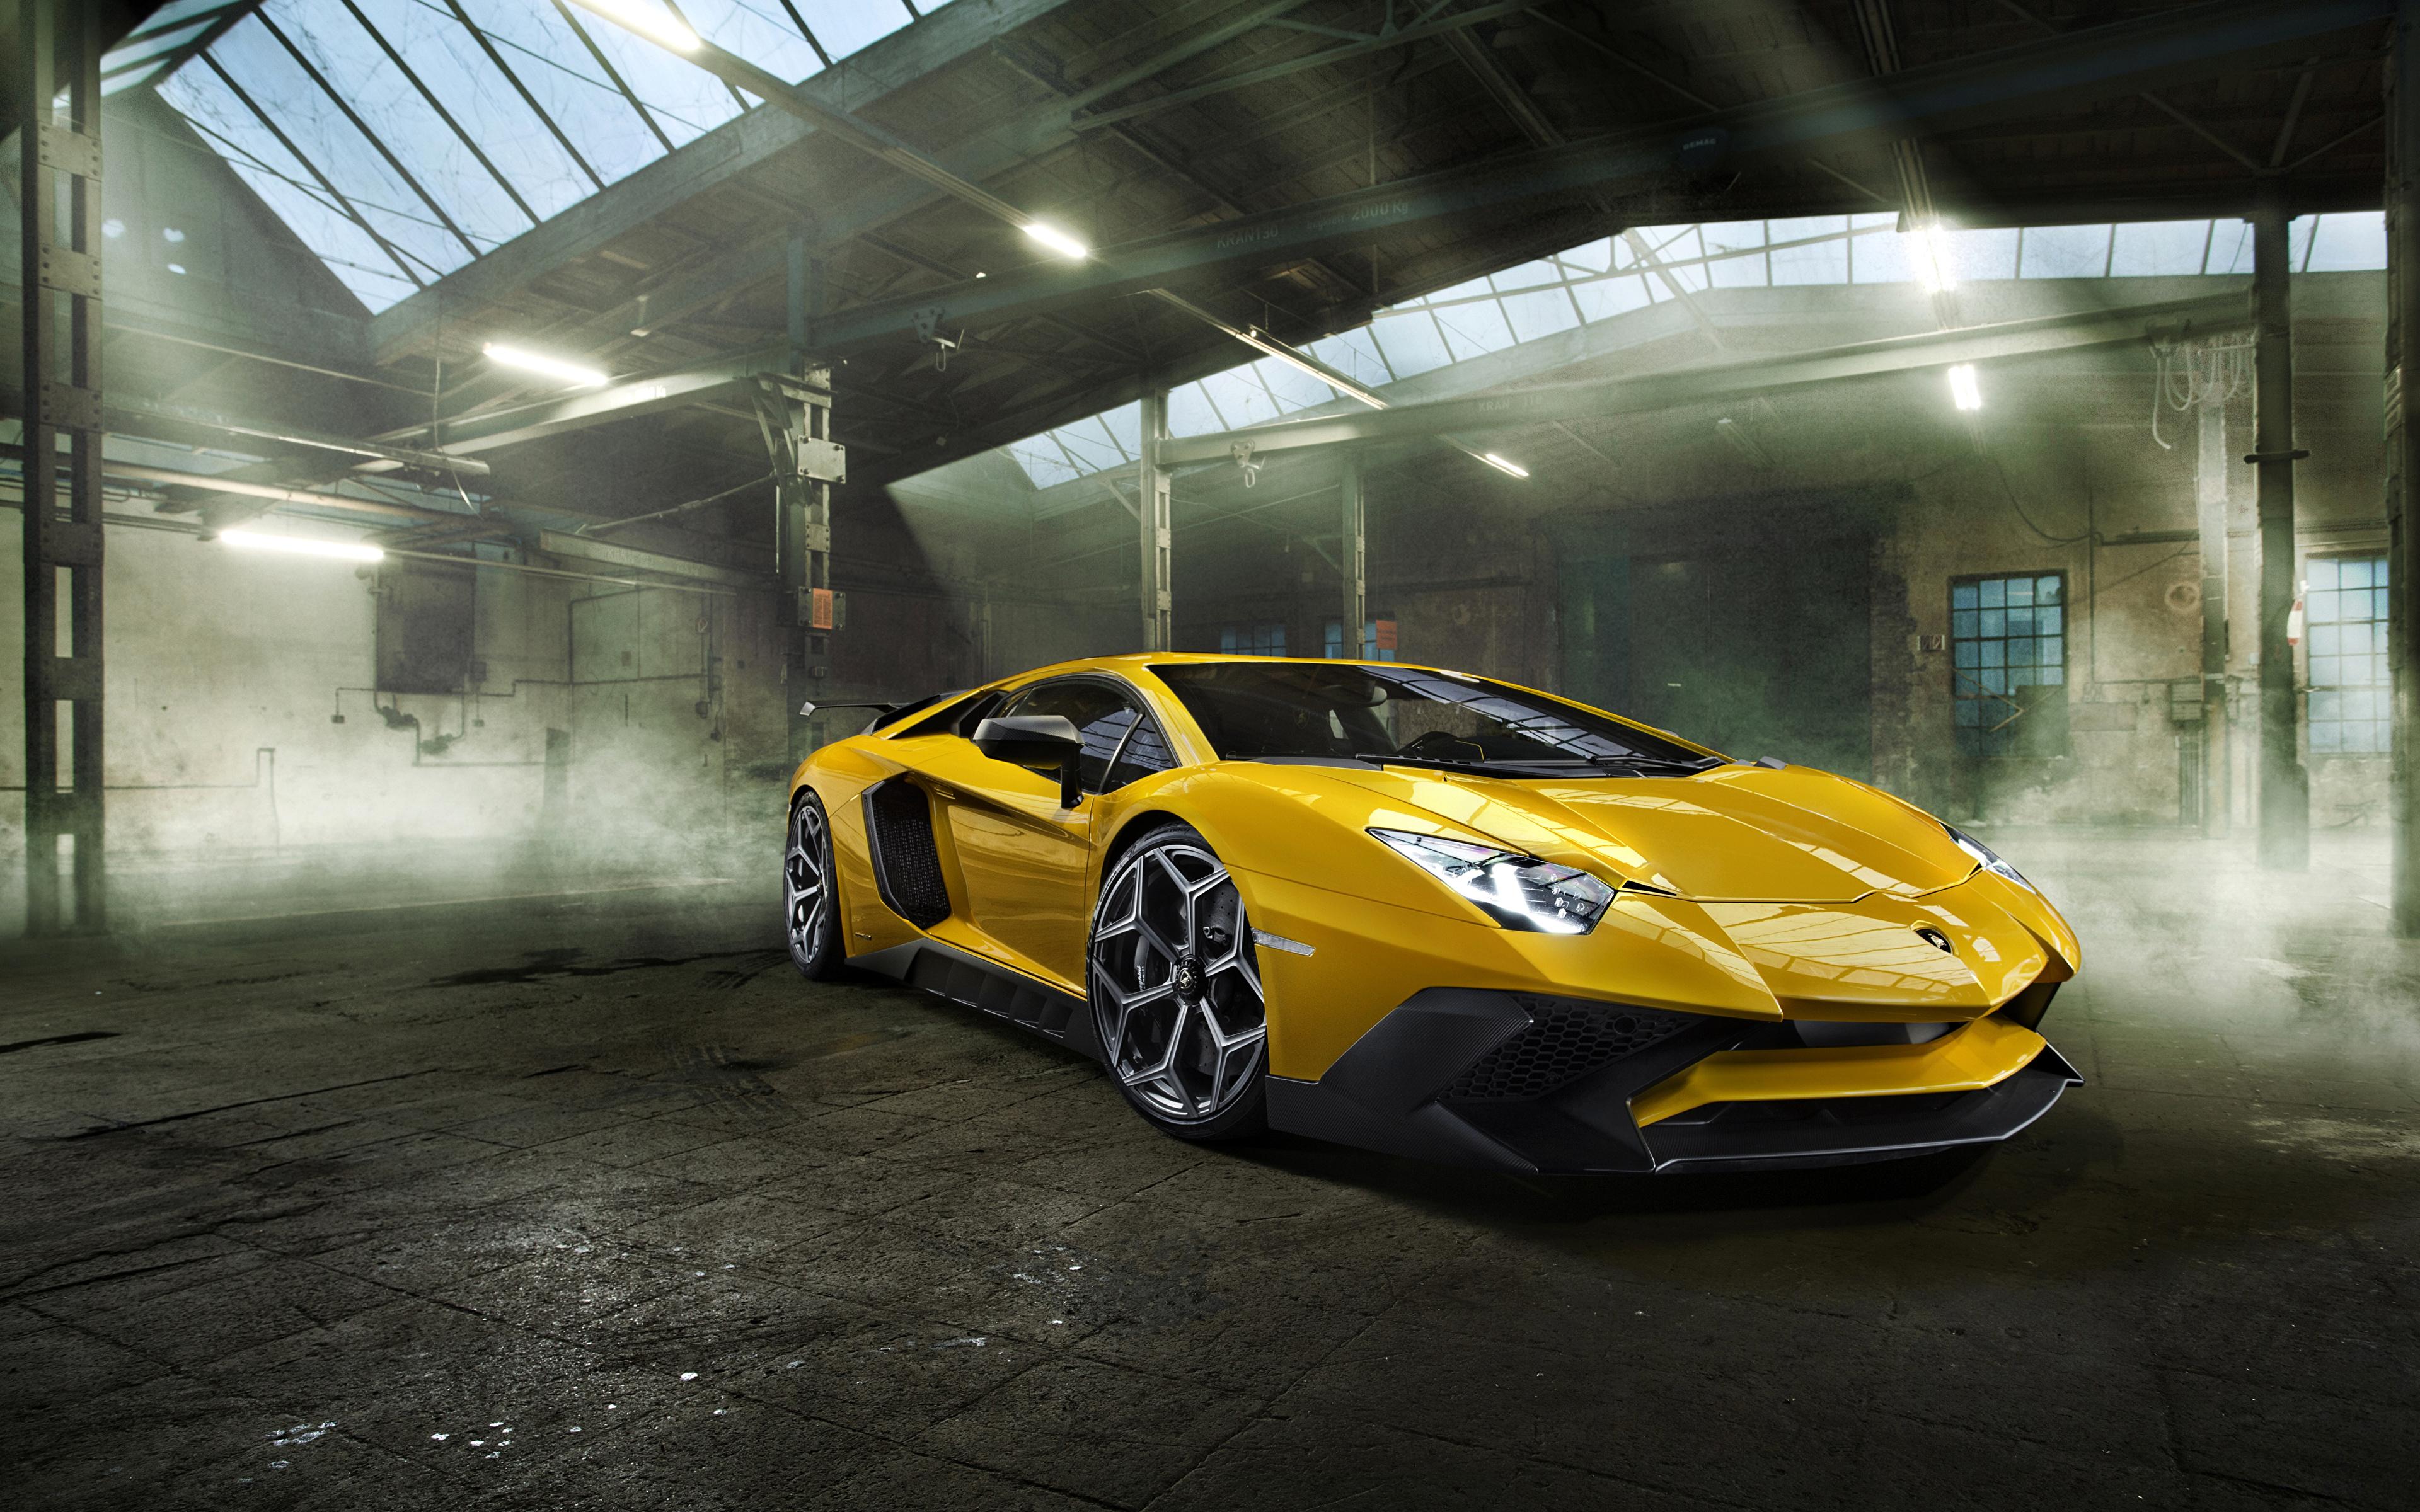 Фотографии Ламборгини 2016 Novitec Torado Aventador LP 750-4 Superveloce желтые машина Металлик 3840x2400 Lamborghini желтых Желтый желтая авто машины автомобиль Автомобили